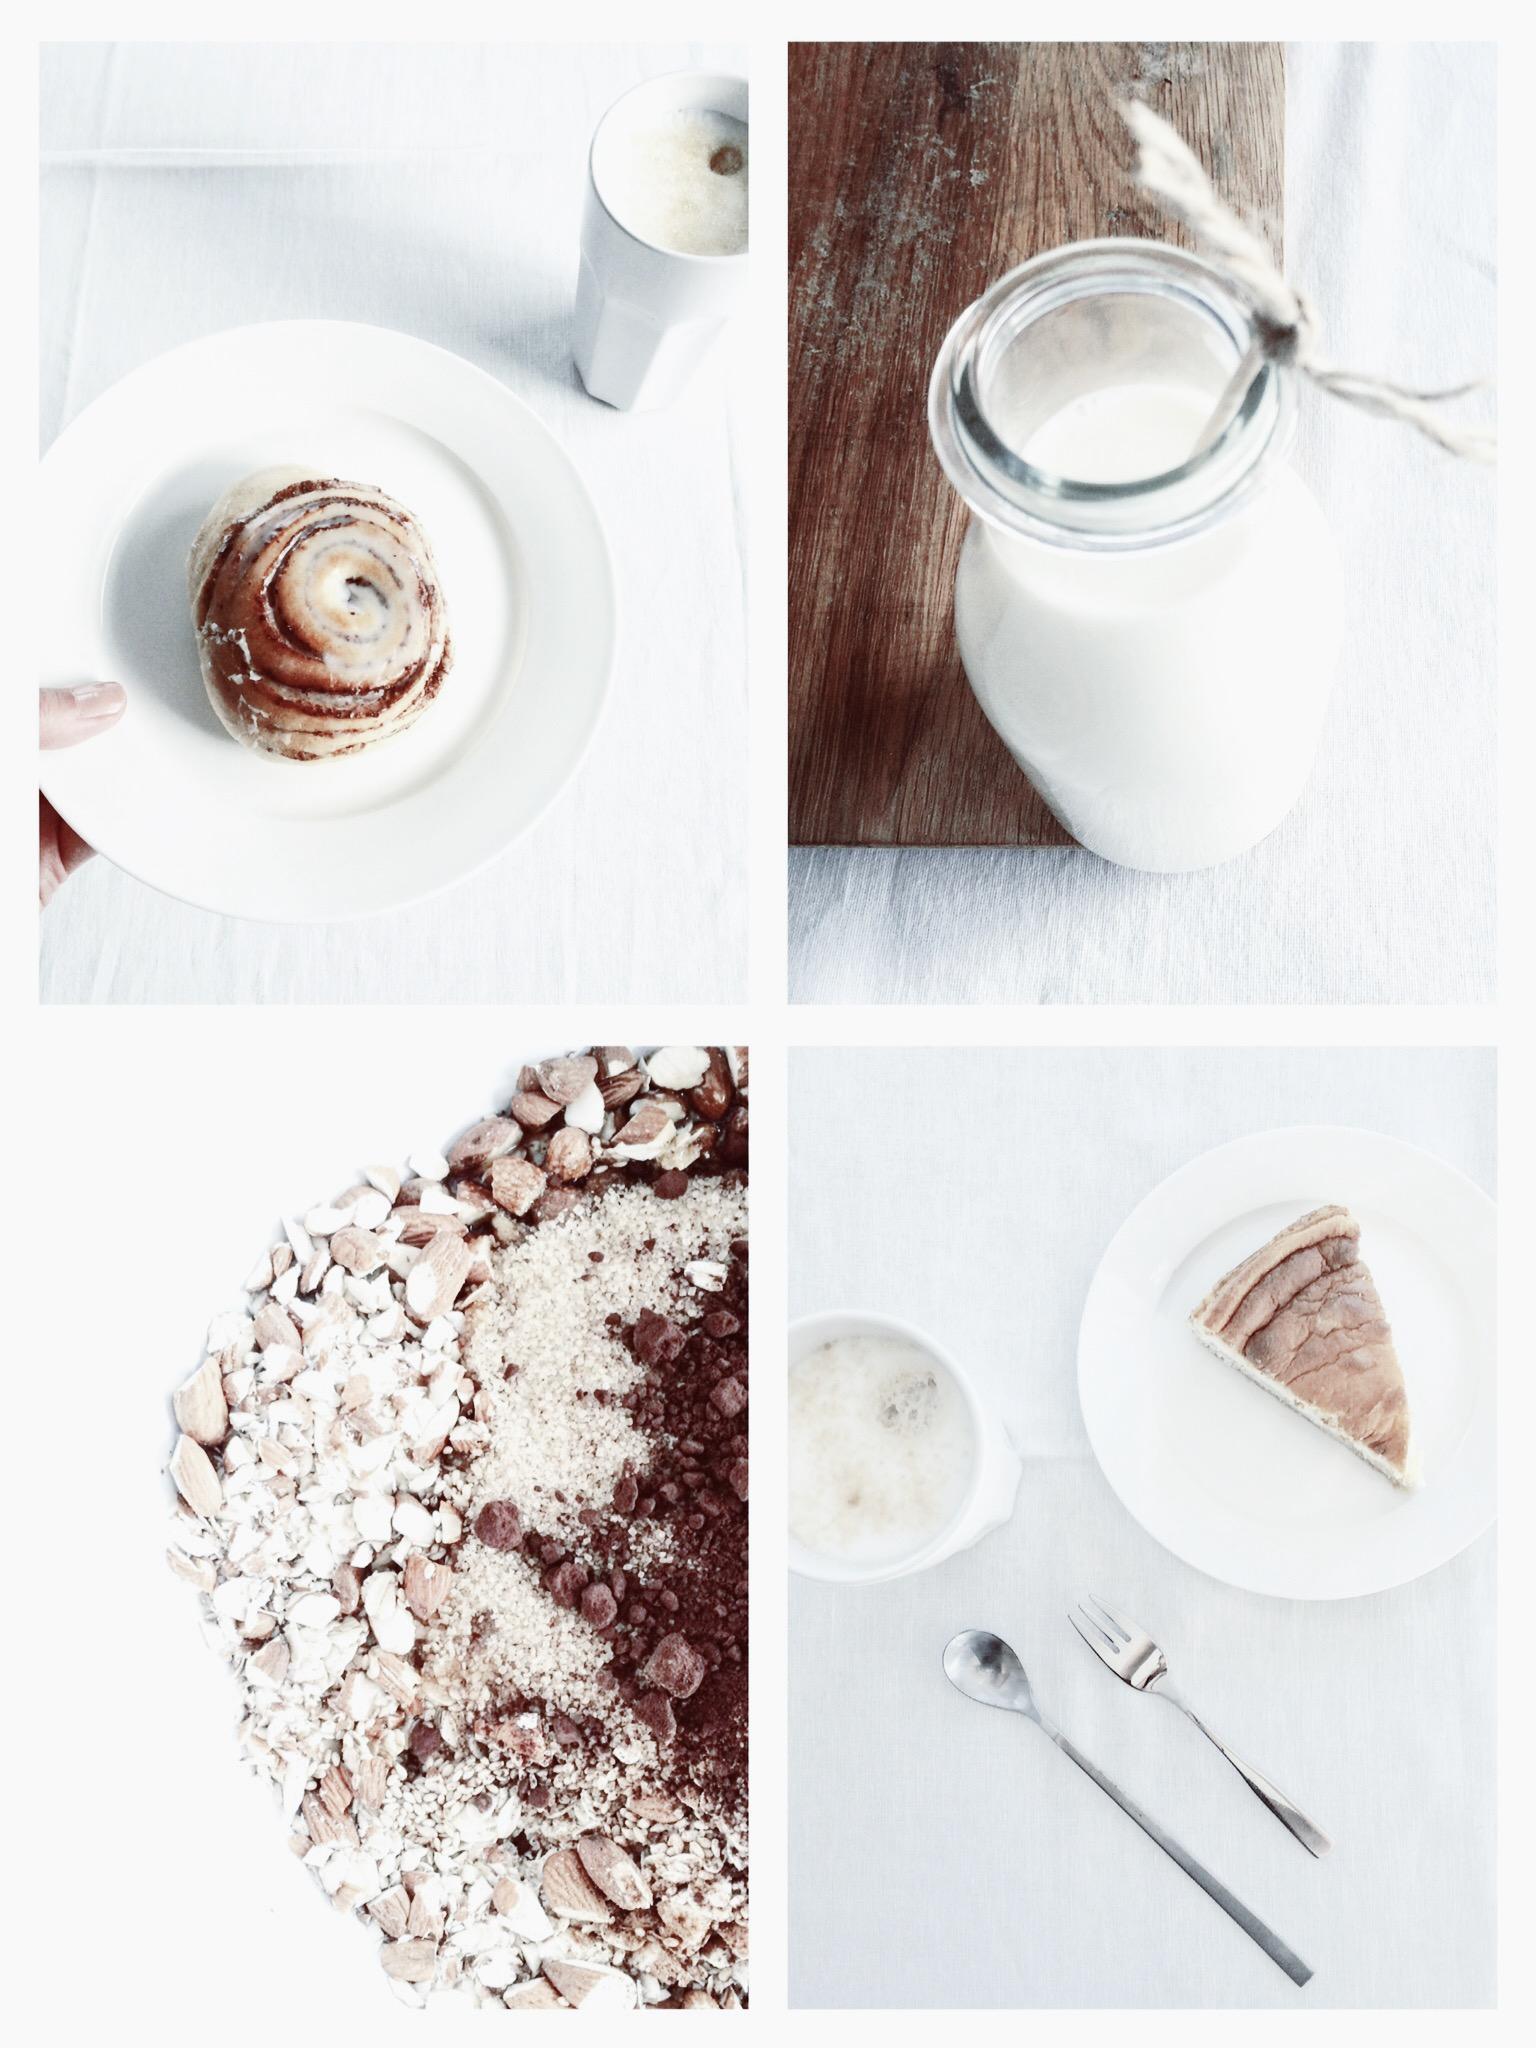 Collage-Oktober-Instagram-Jennadores-Blog-Rückblick-Foodbilder